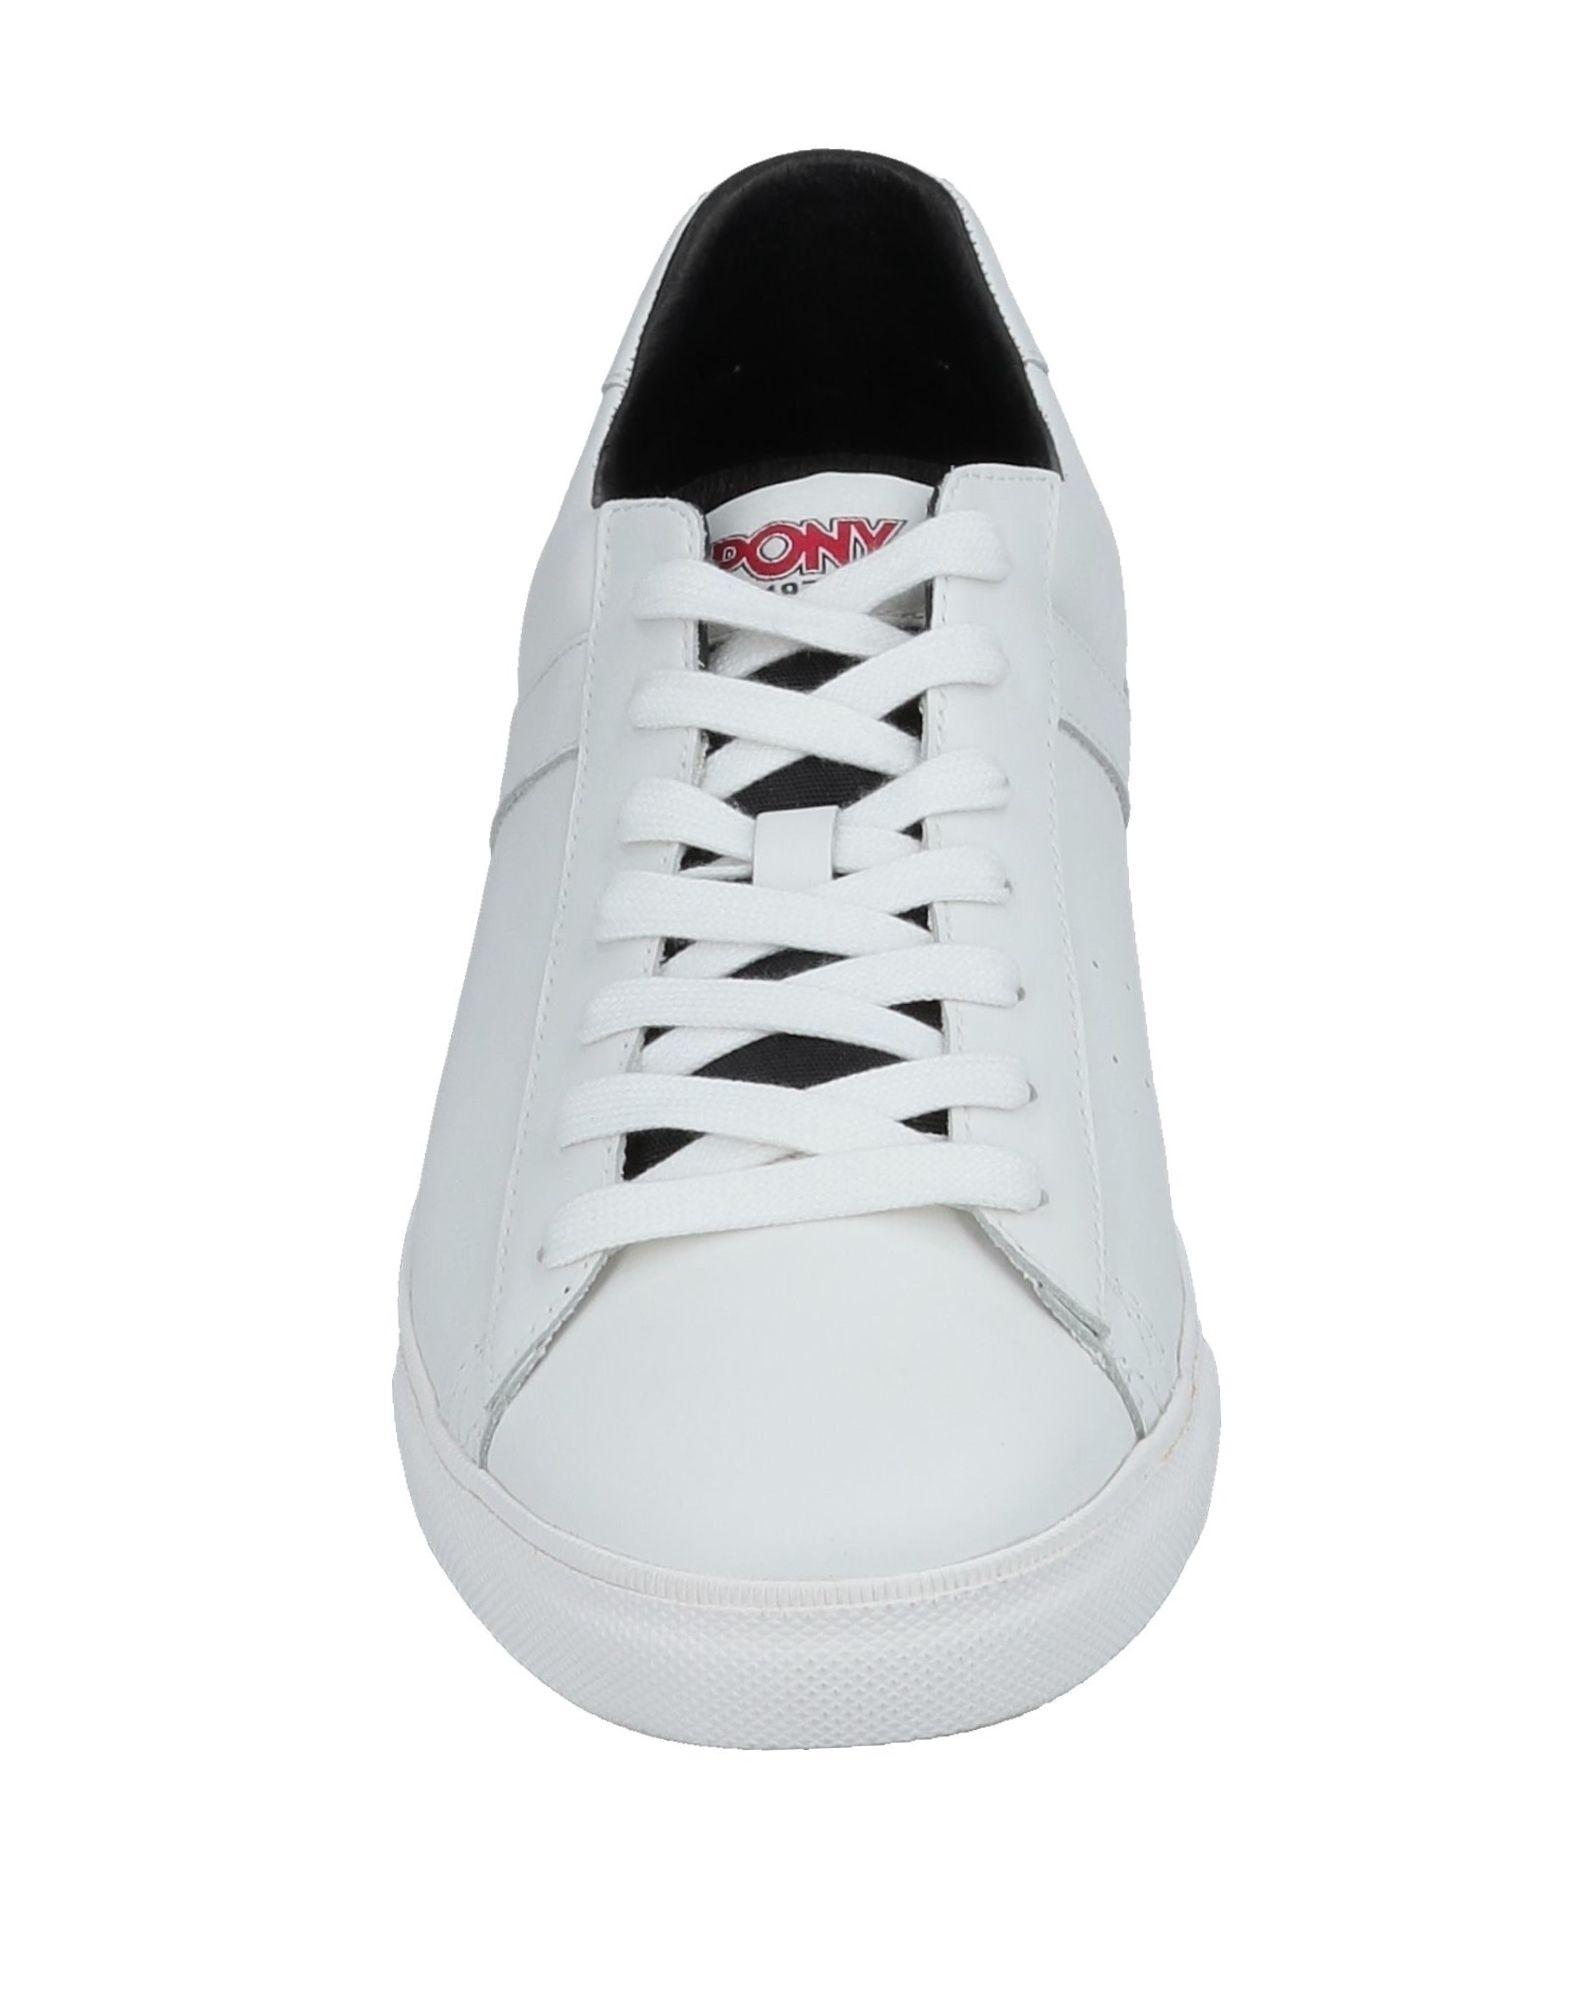 Sneakers Pony Uomo - 11561207WP 11561207WP 11561207WP elegante 4ce0fa